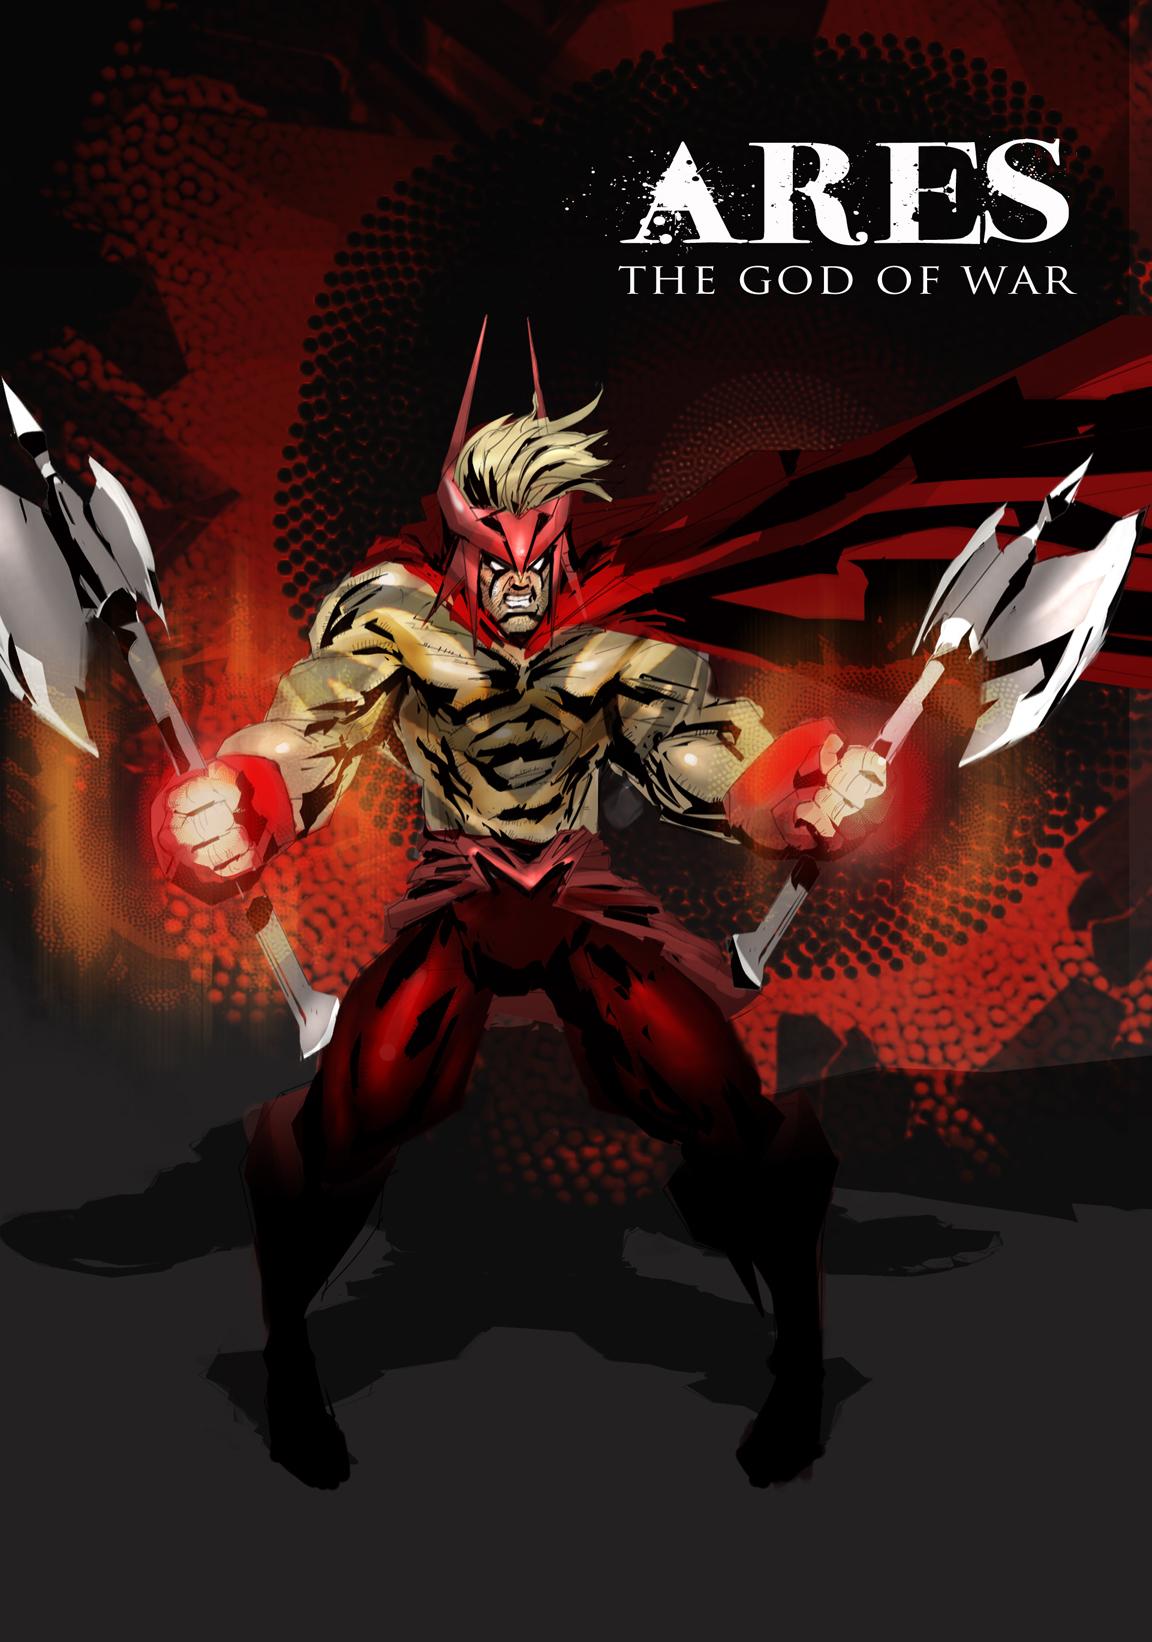 ARES God of War by prmn on deviantART